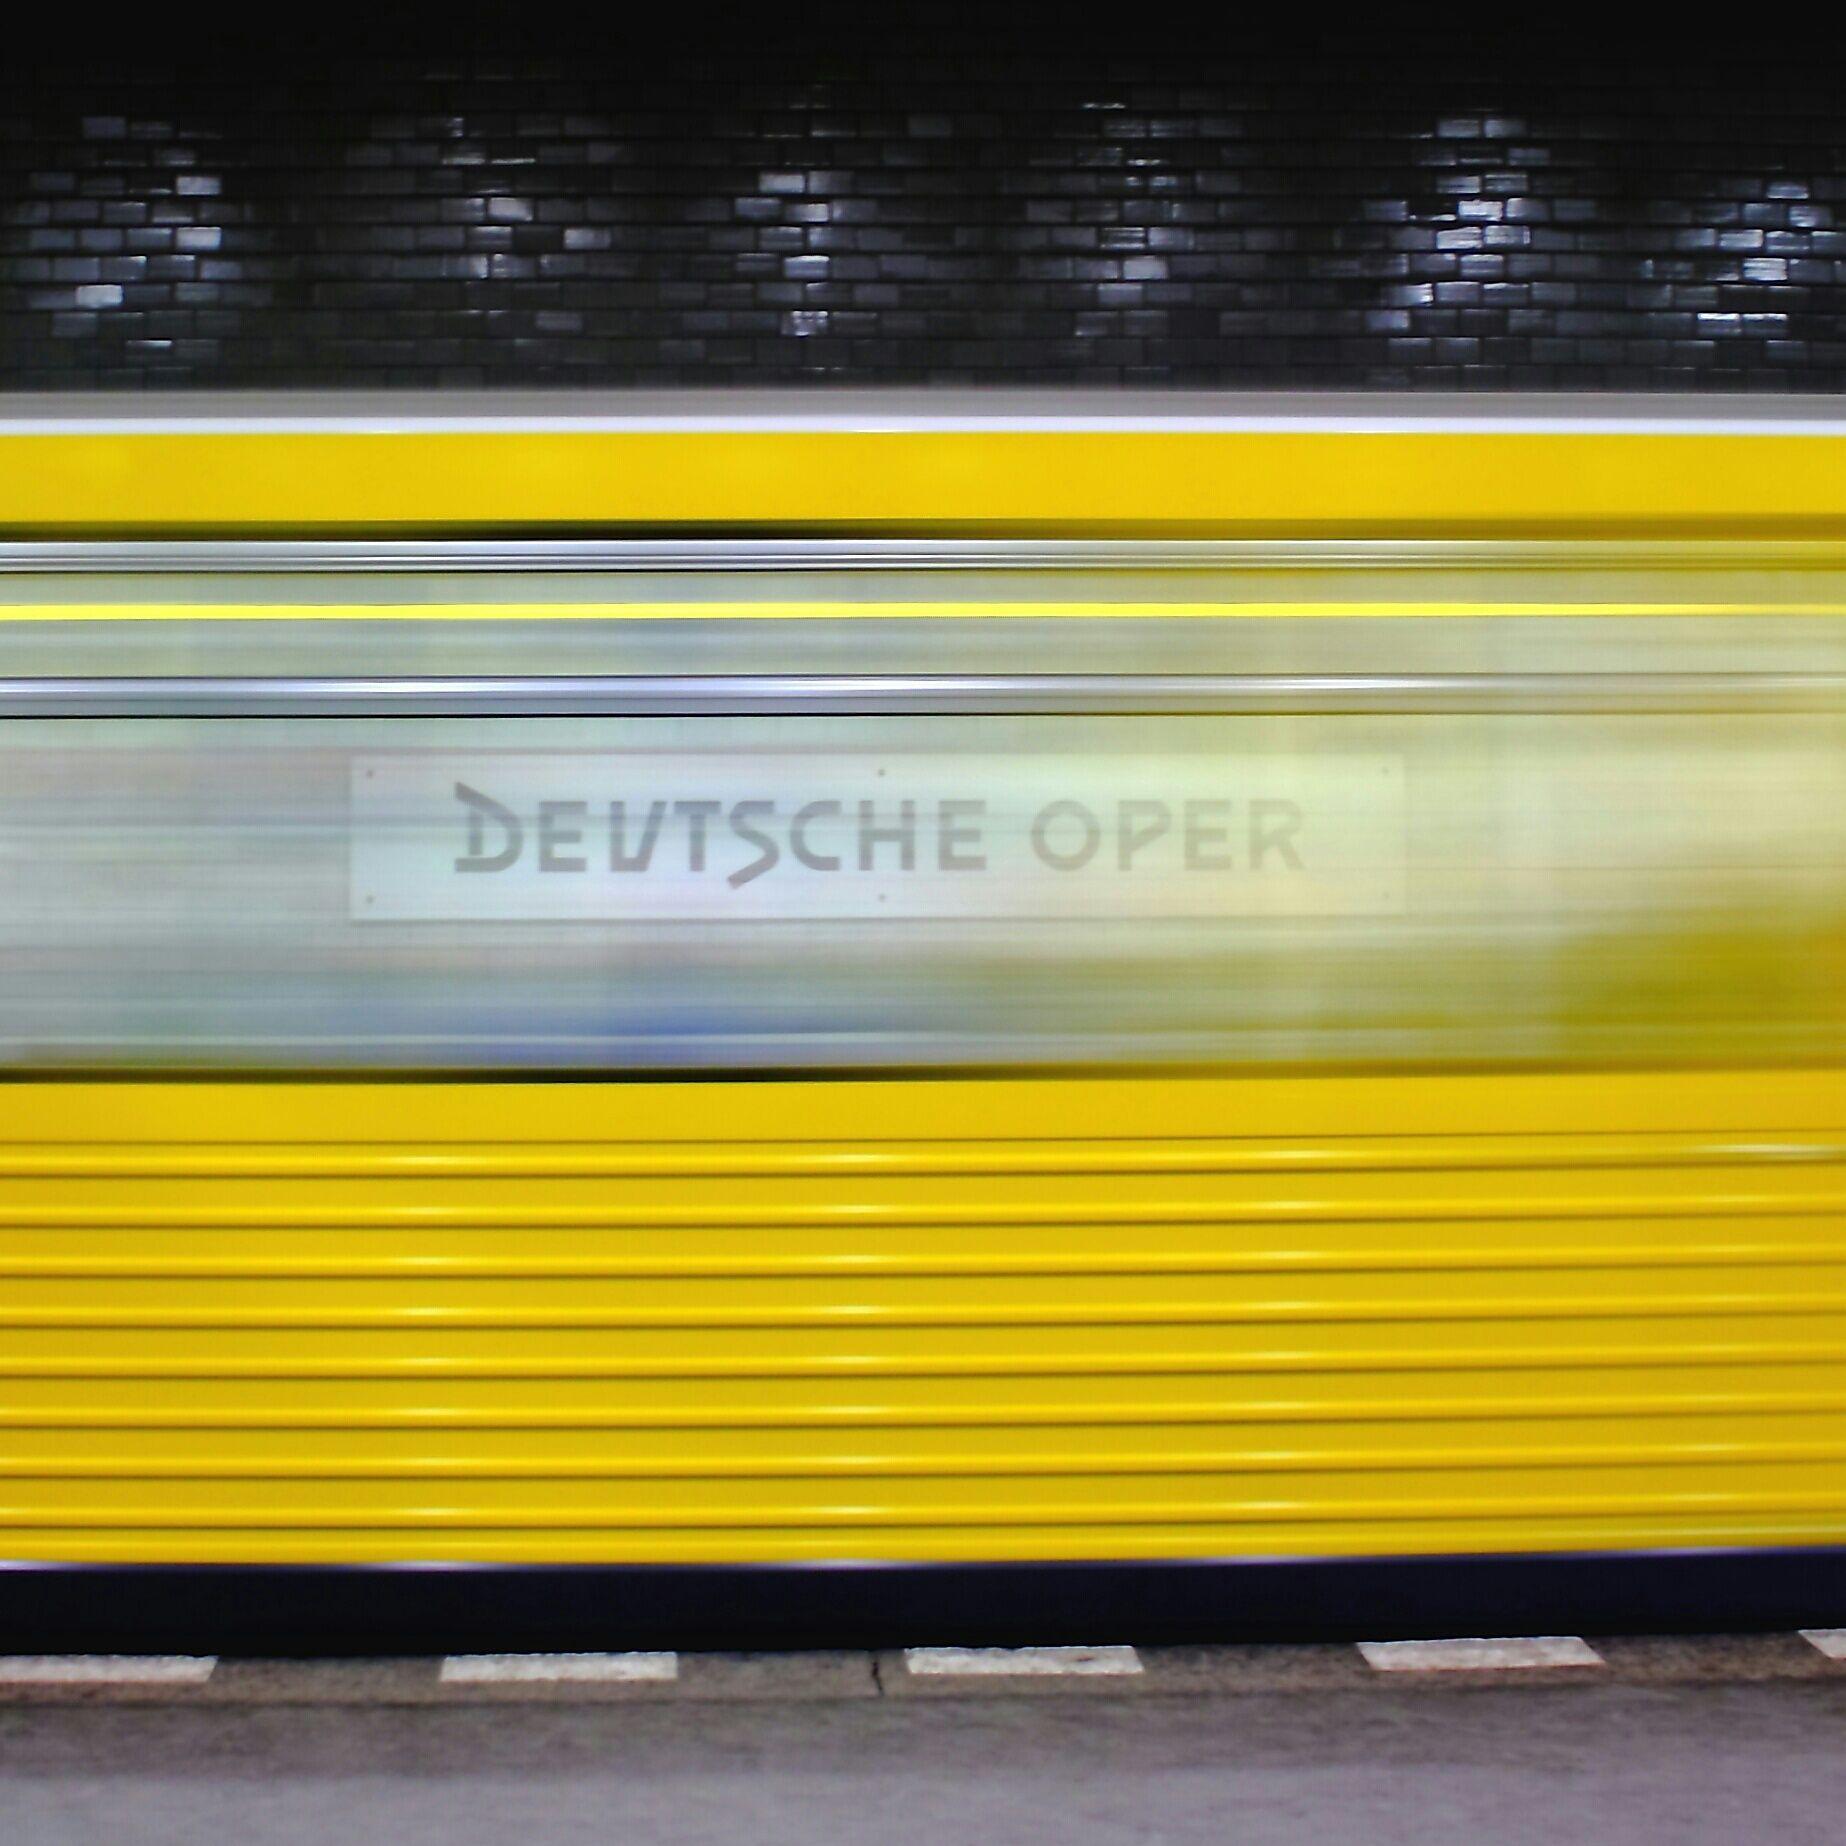 U-Bahn Deutsche Oper Berlin | repinned by an #Reiseagentur für Kita- und #Klassenfahrten from #Berlin / #Germany - www.altai-adventure.de | Follow us on www.facebook.com/AltaiAdventure#!/AltaiAdventure